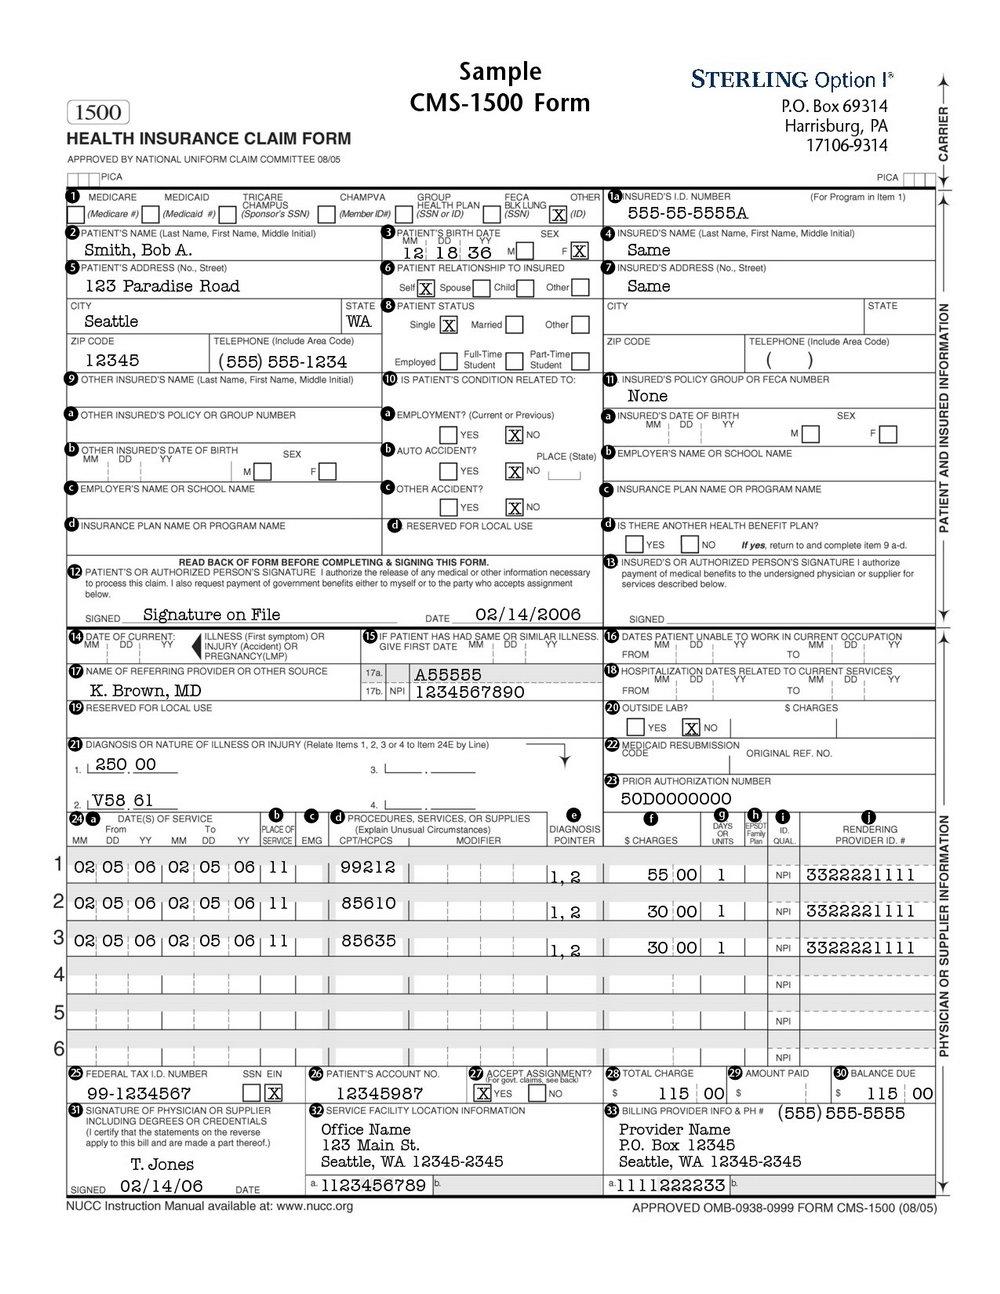 1500 Health Insurance Claim Form Template